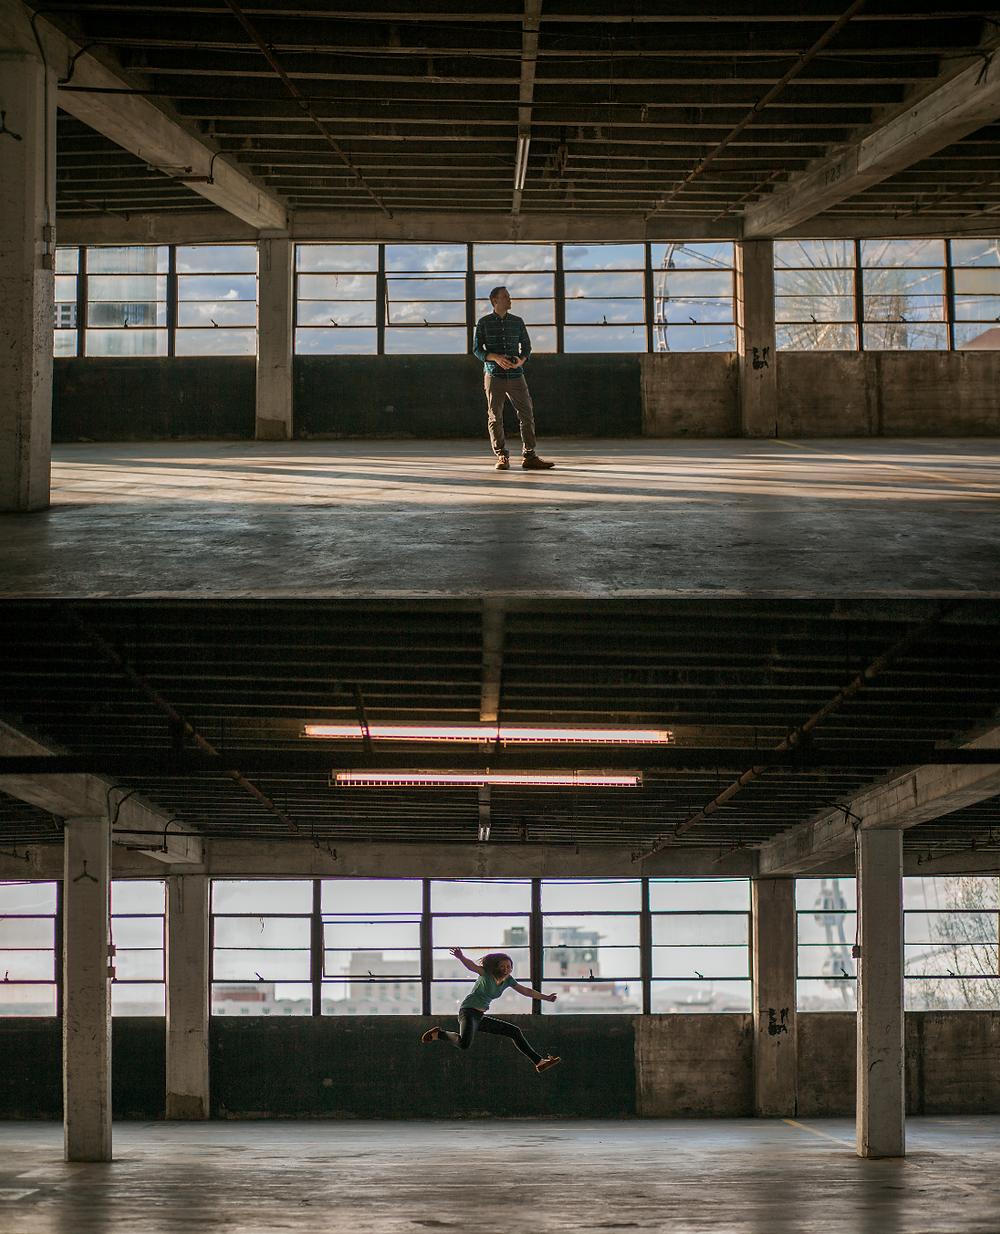 Parking garage in Atlanta